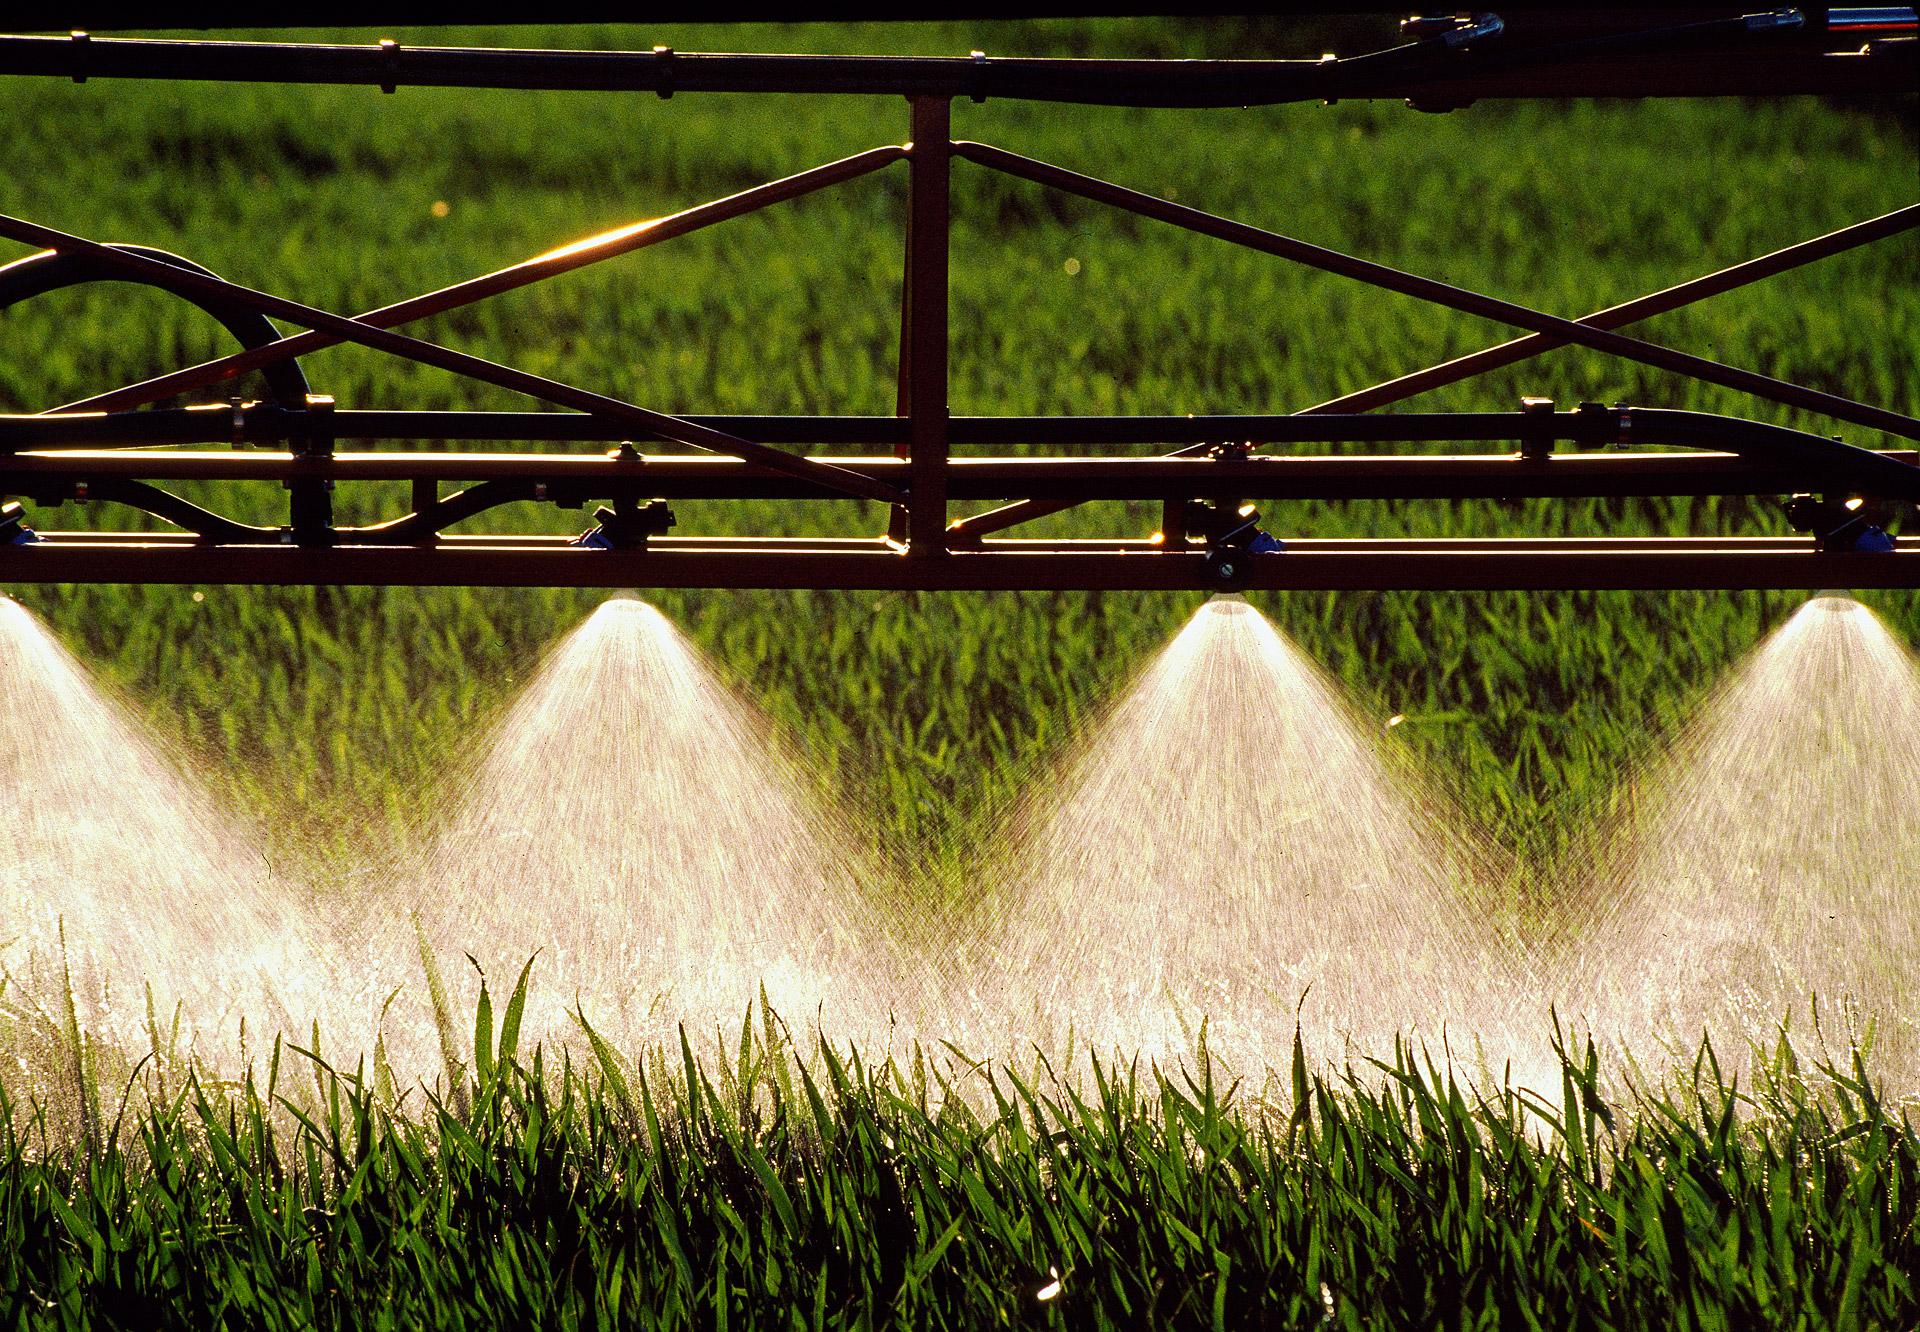 Pesticides are being sprinkled onto some crops. Hardi International